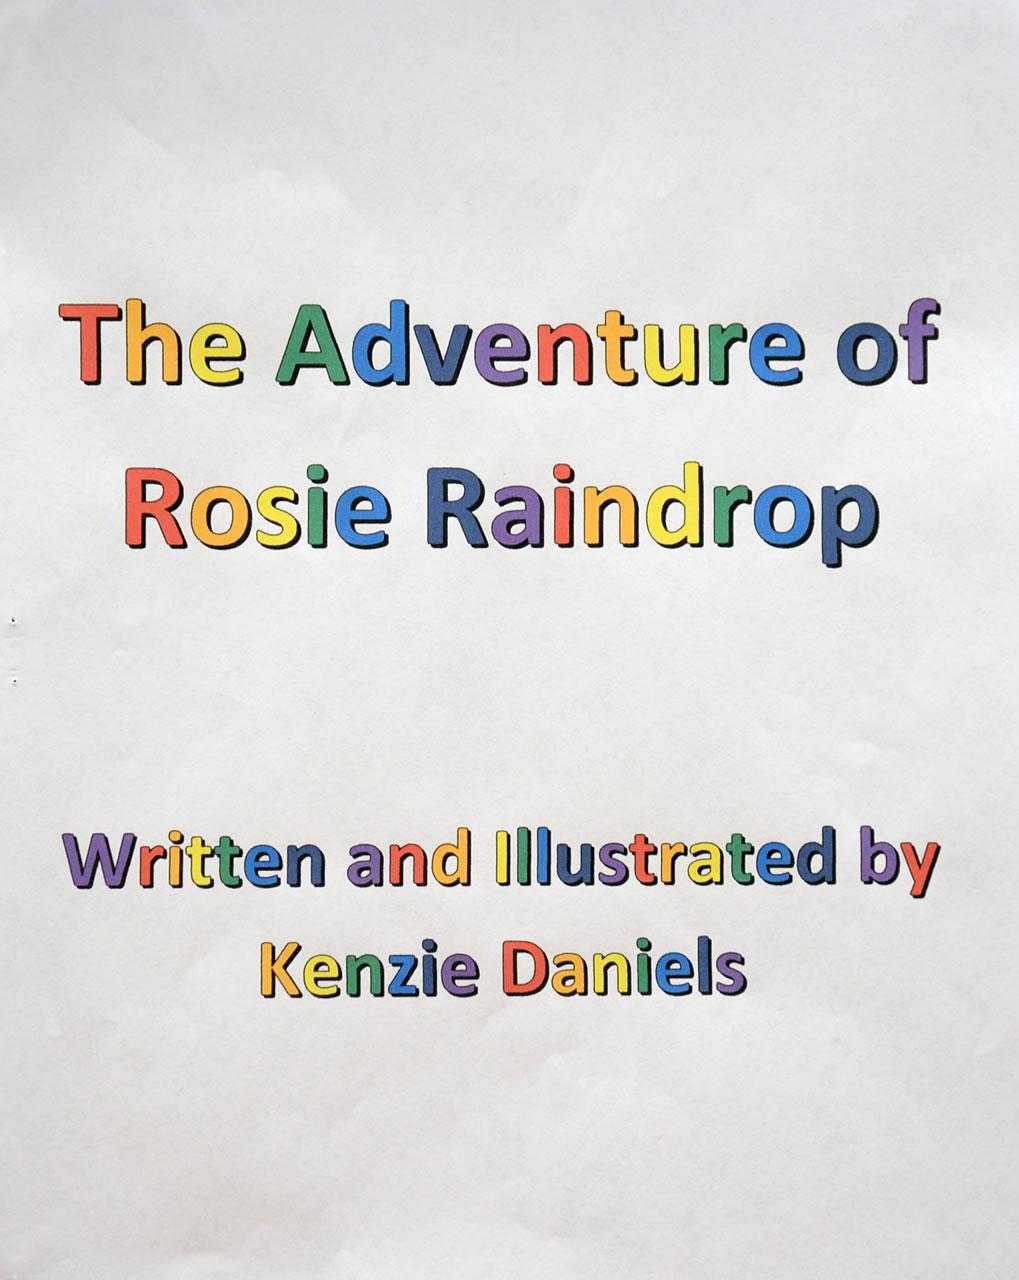 Rosie_Raindrop_01